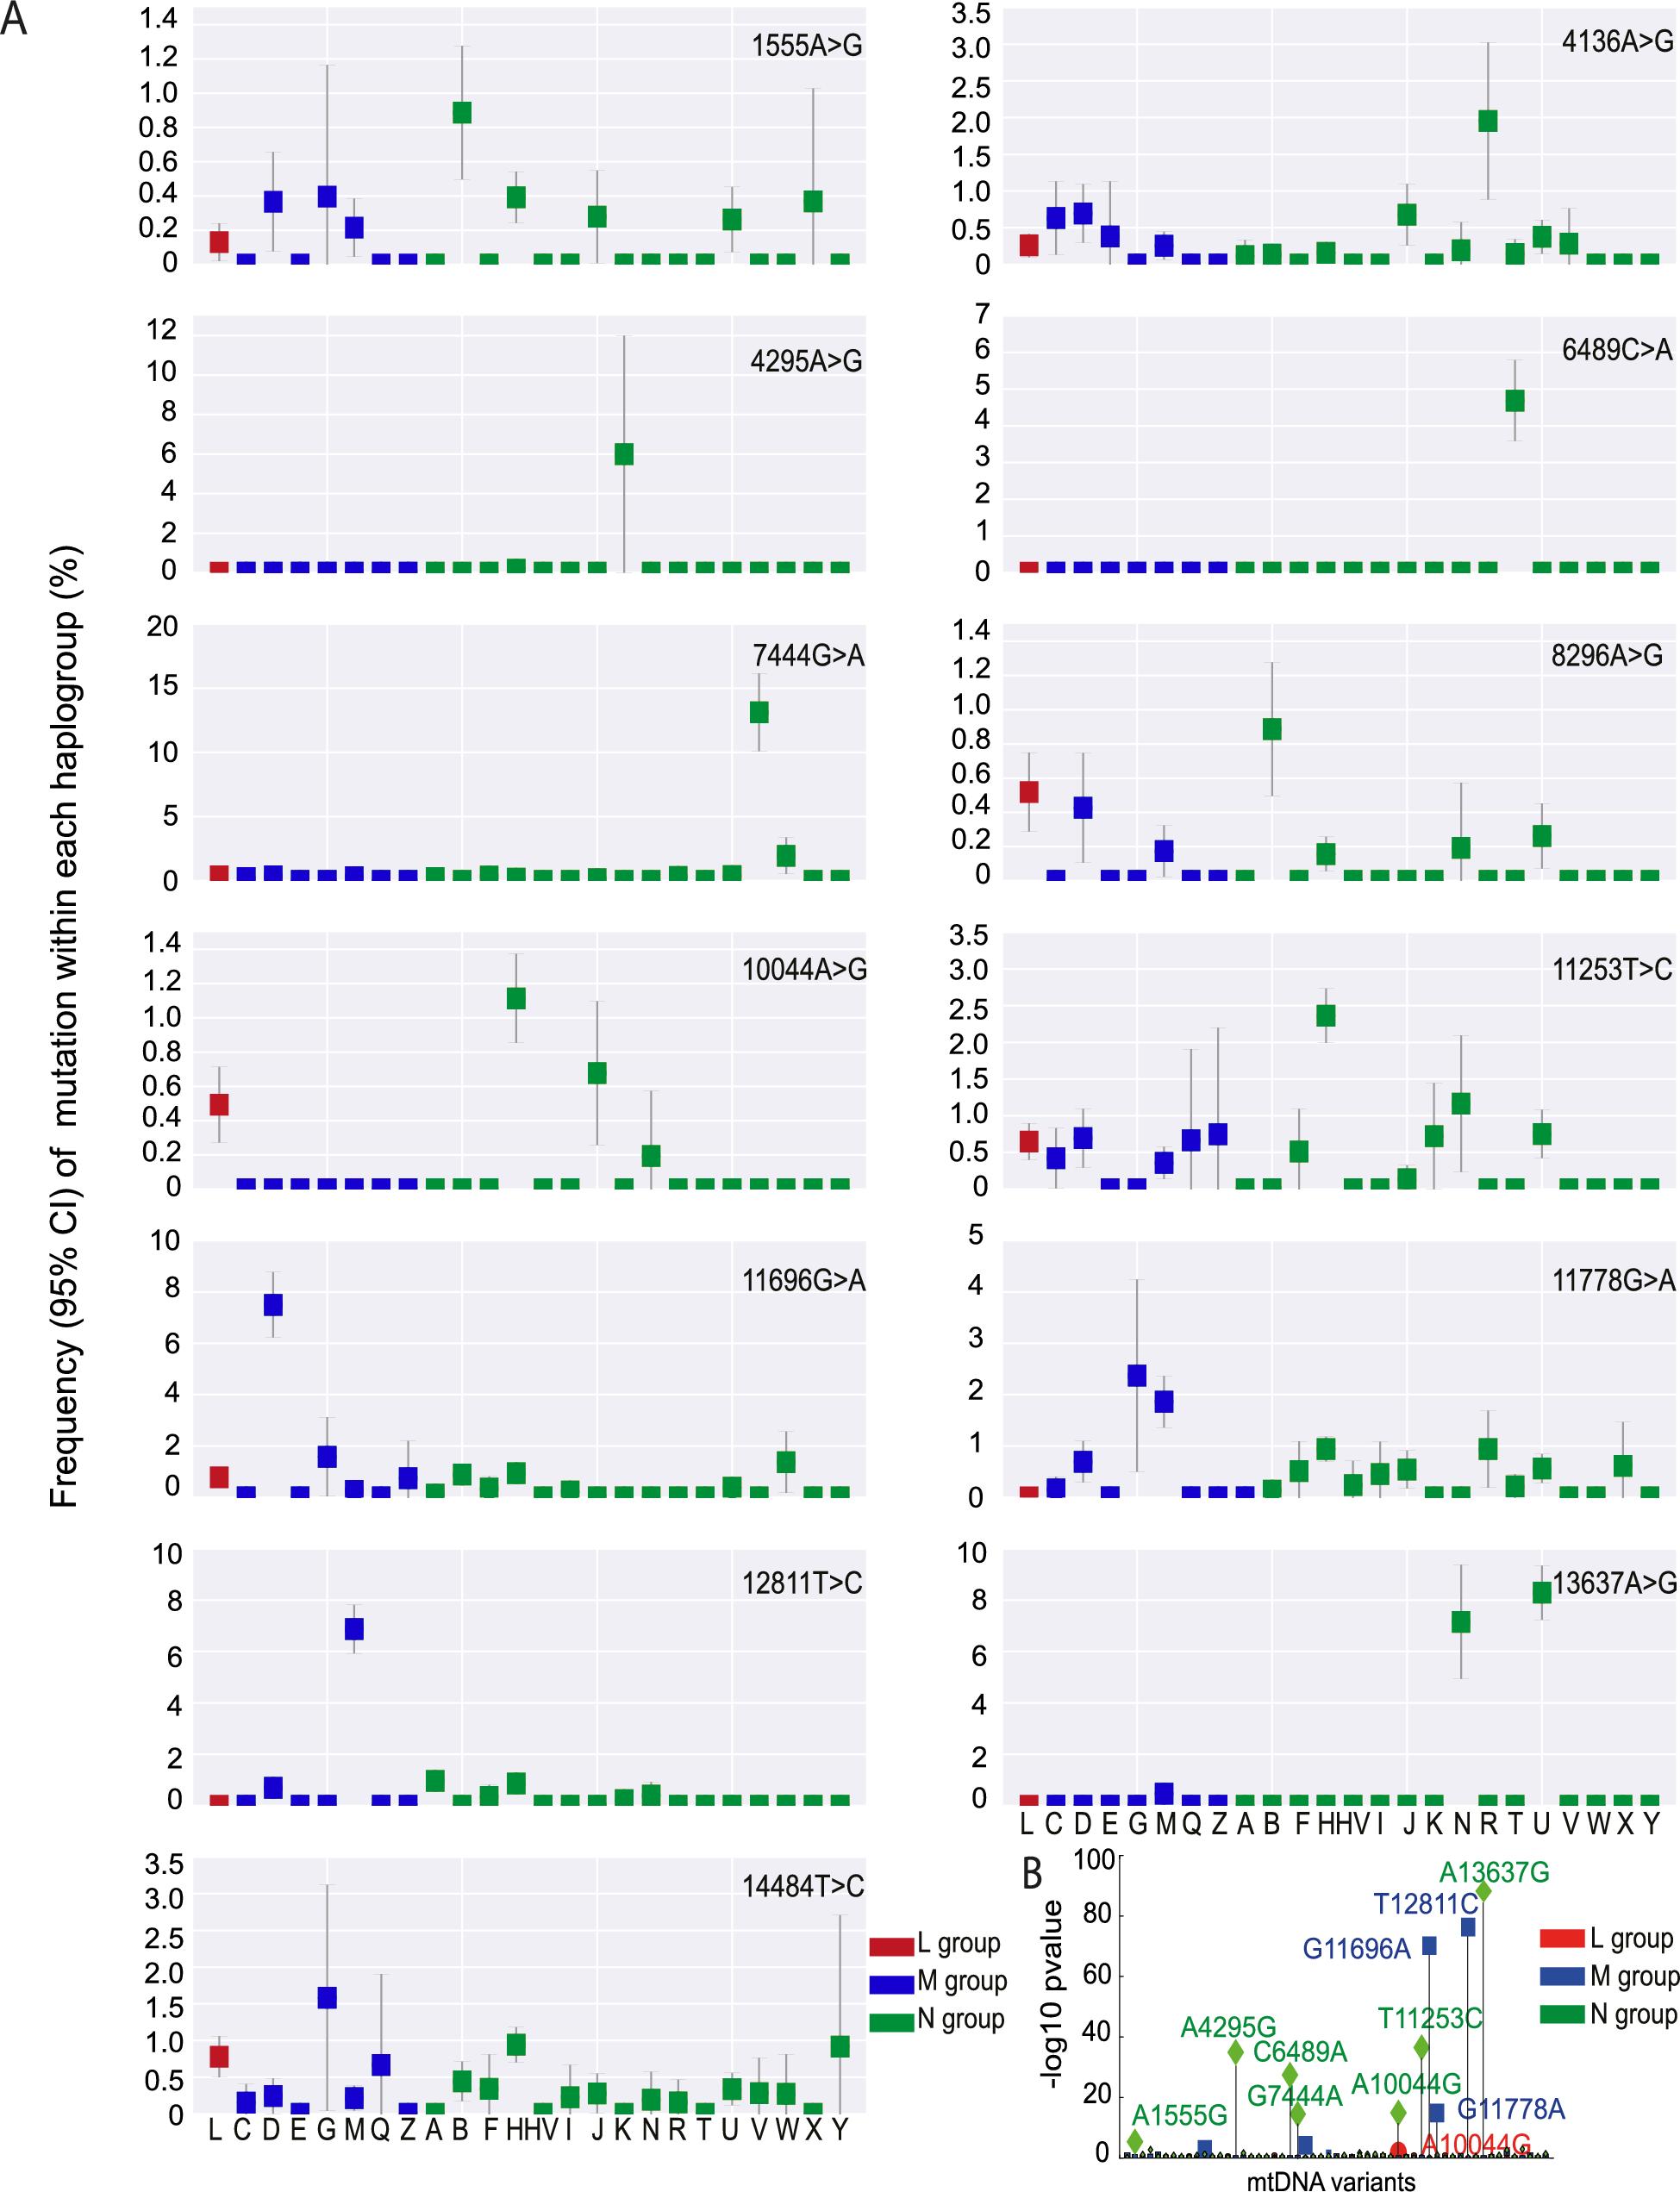 Frequency of disease causing mtDNA mutations in each macro-haplogroup.